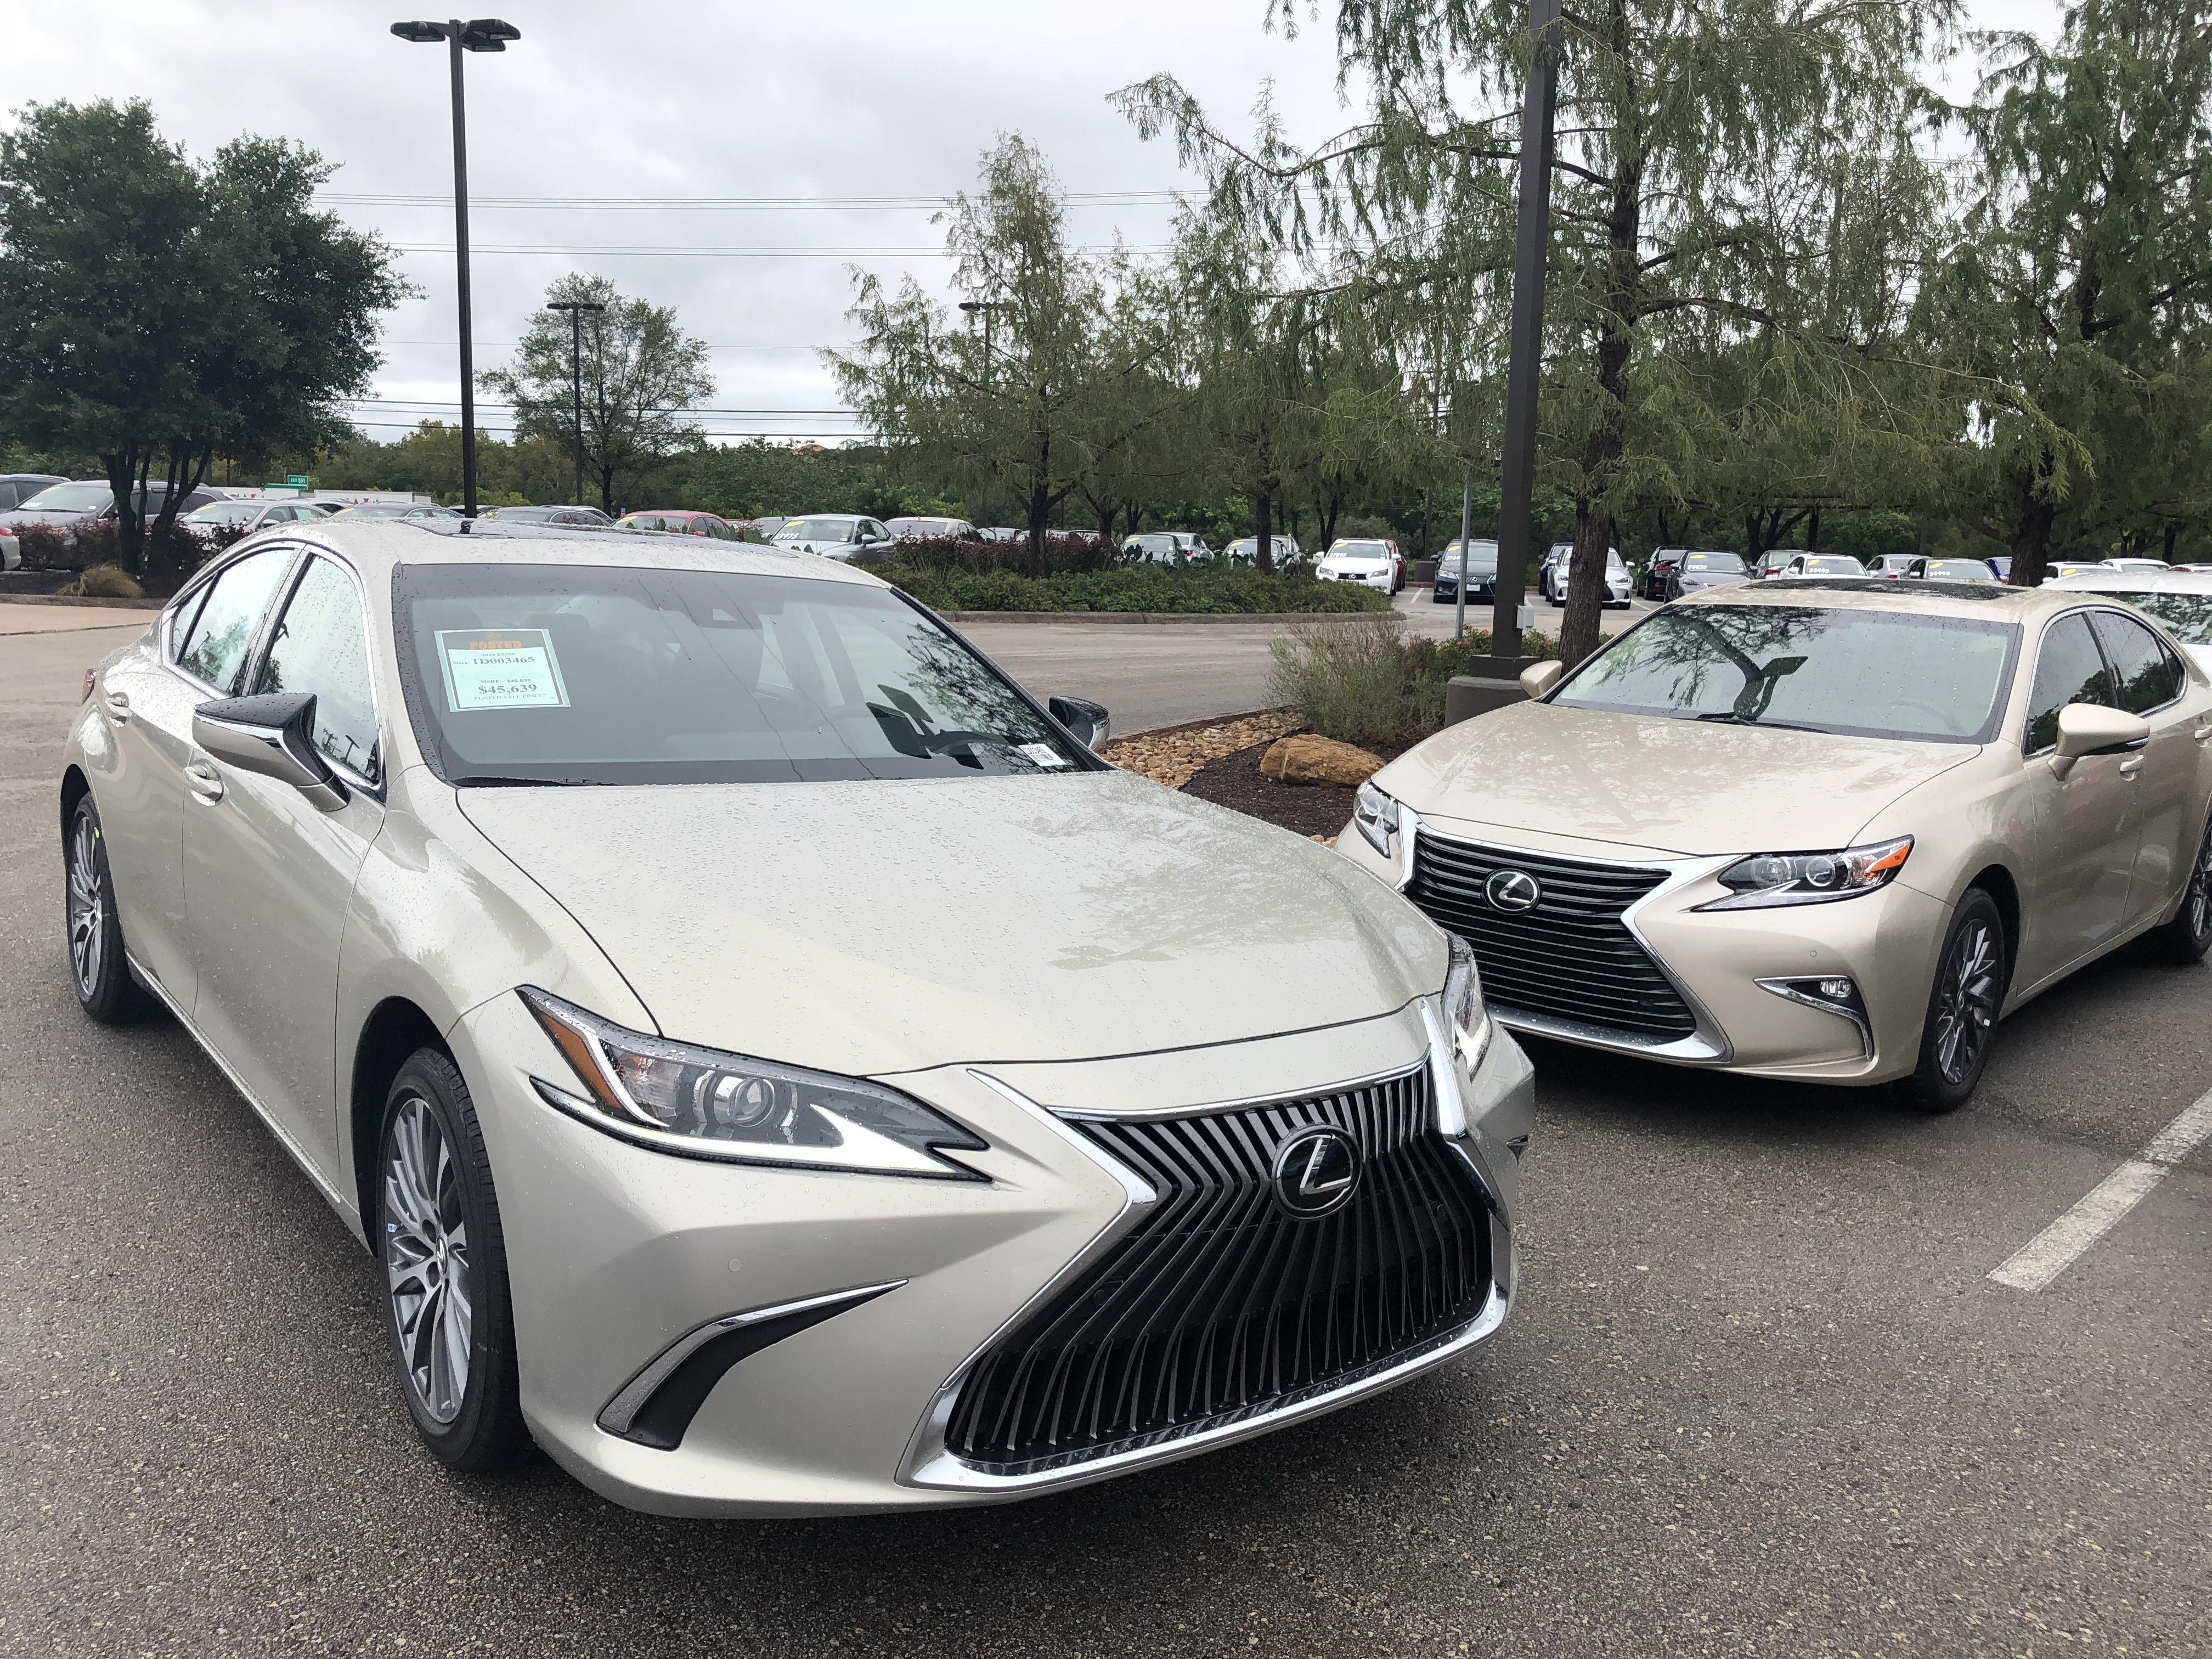 2020 Lexus Es Luxury Sedan Lexus Es Lexus Models New Lexus